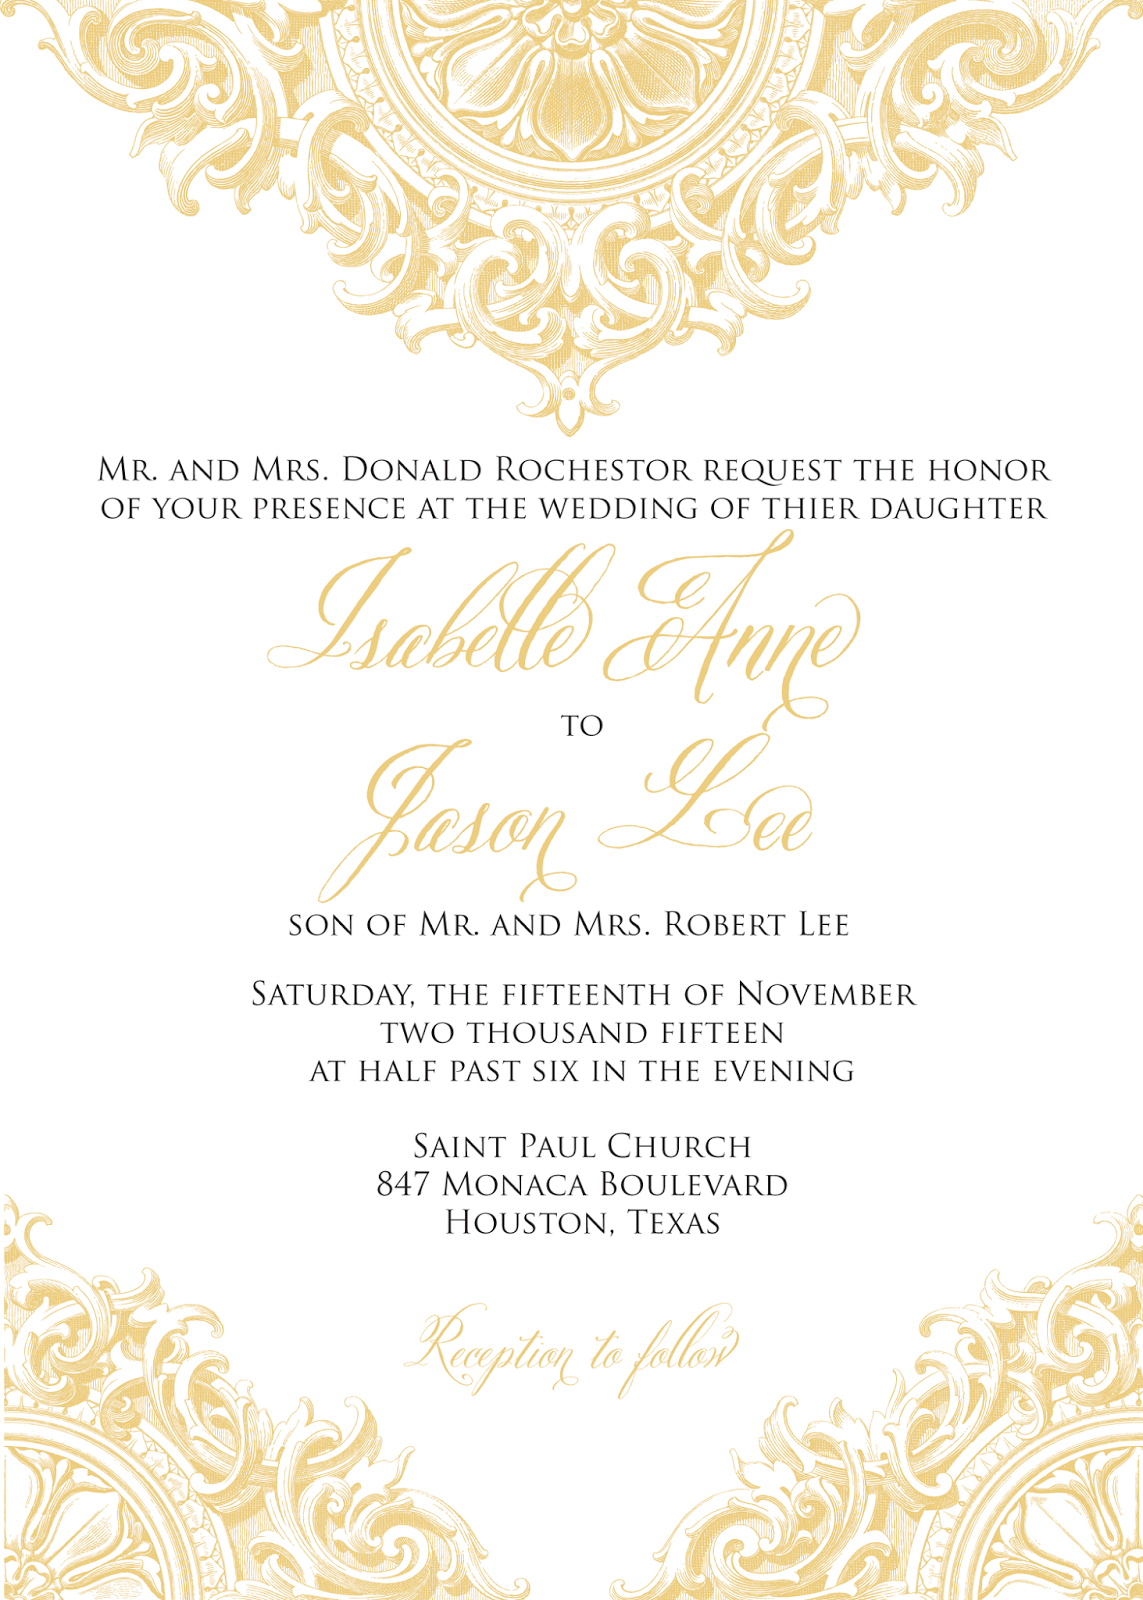 HD wallpapers beach wedding invitations templates free ...